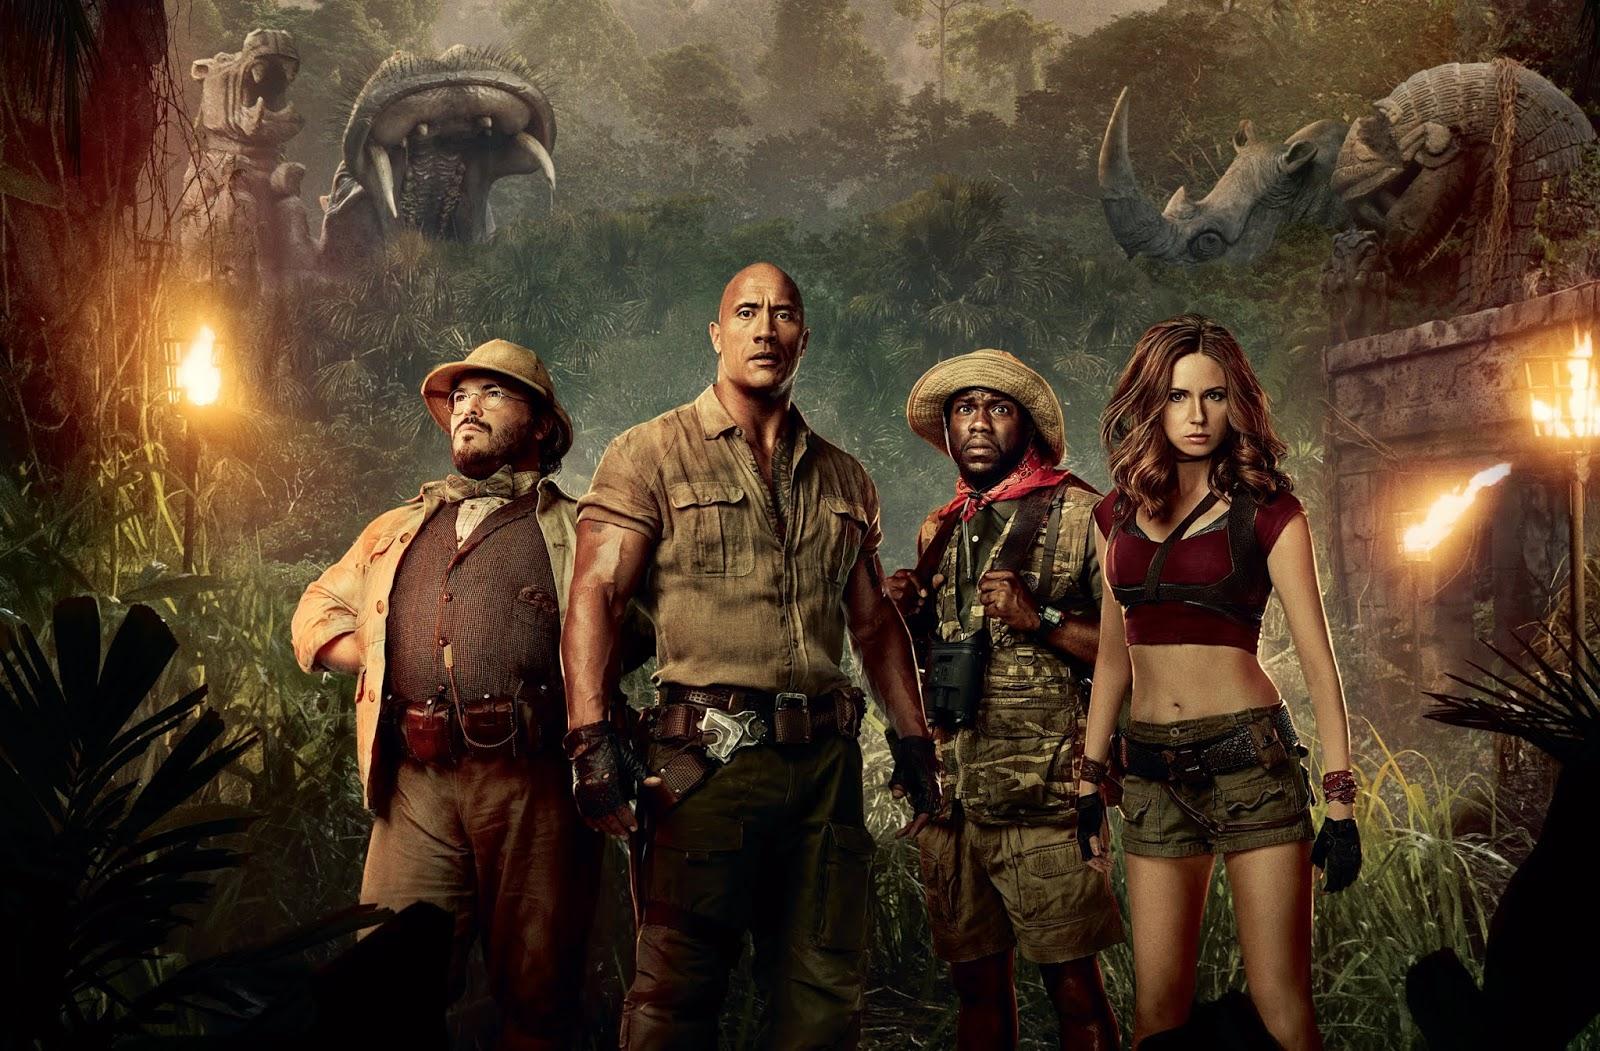 deadpool 2 full movie in tamil download moviesda